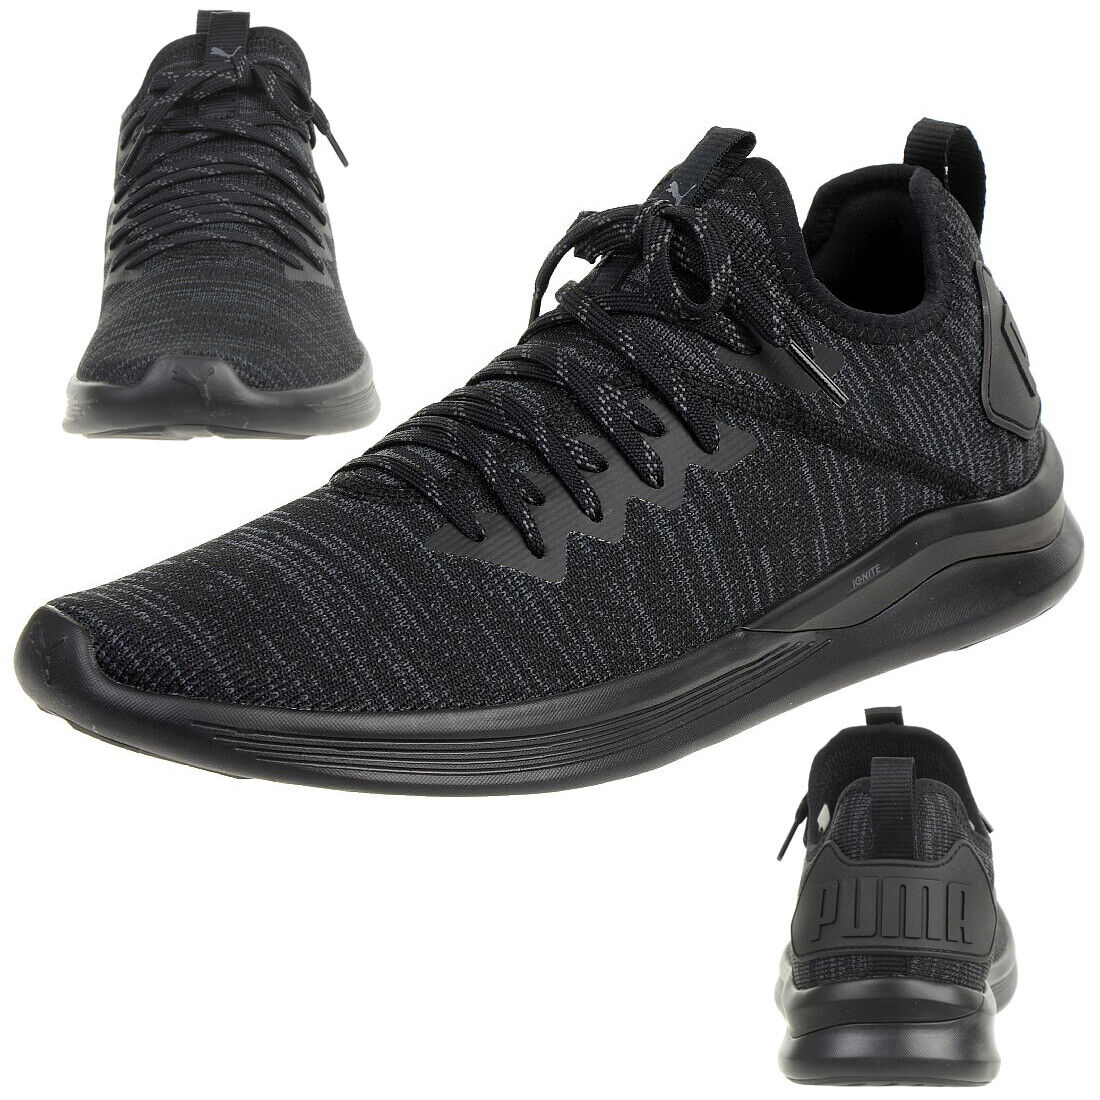 Nike Schuhe Downshifter 8, 908984001, Größe: 48,5 | real